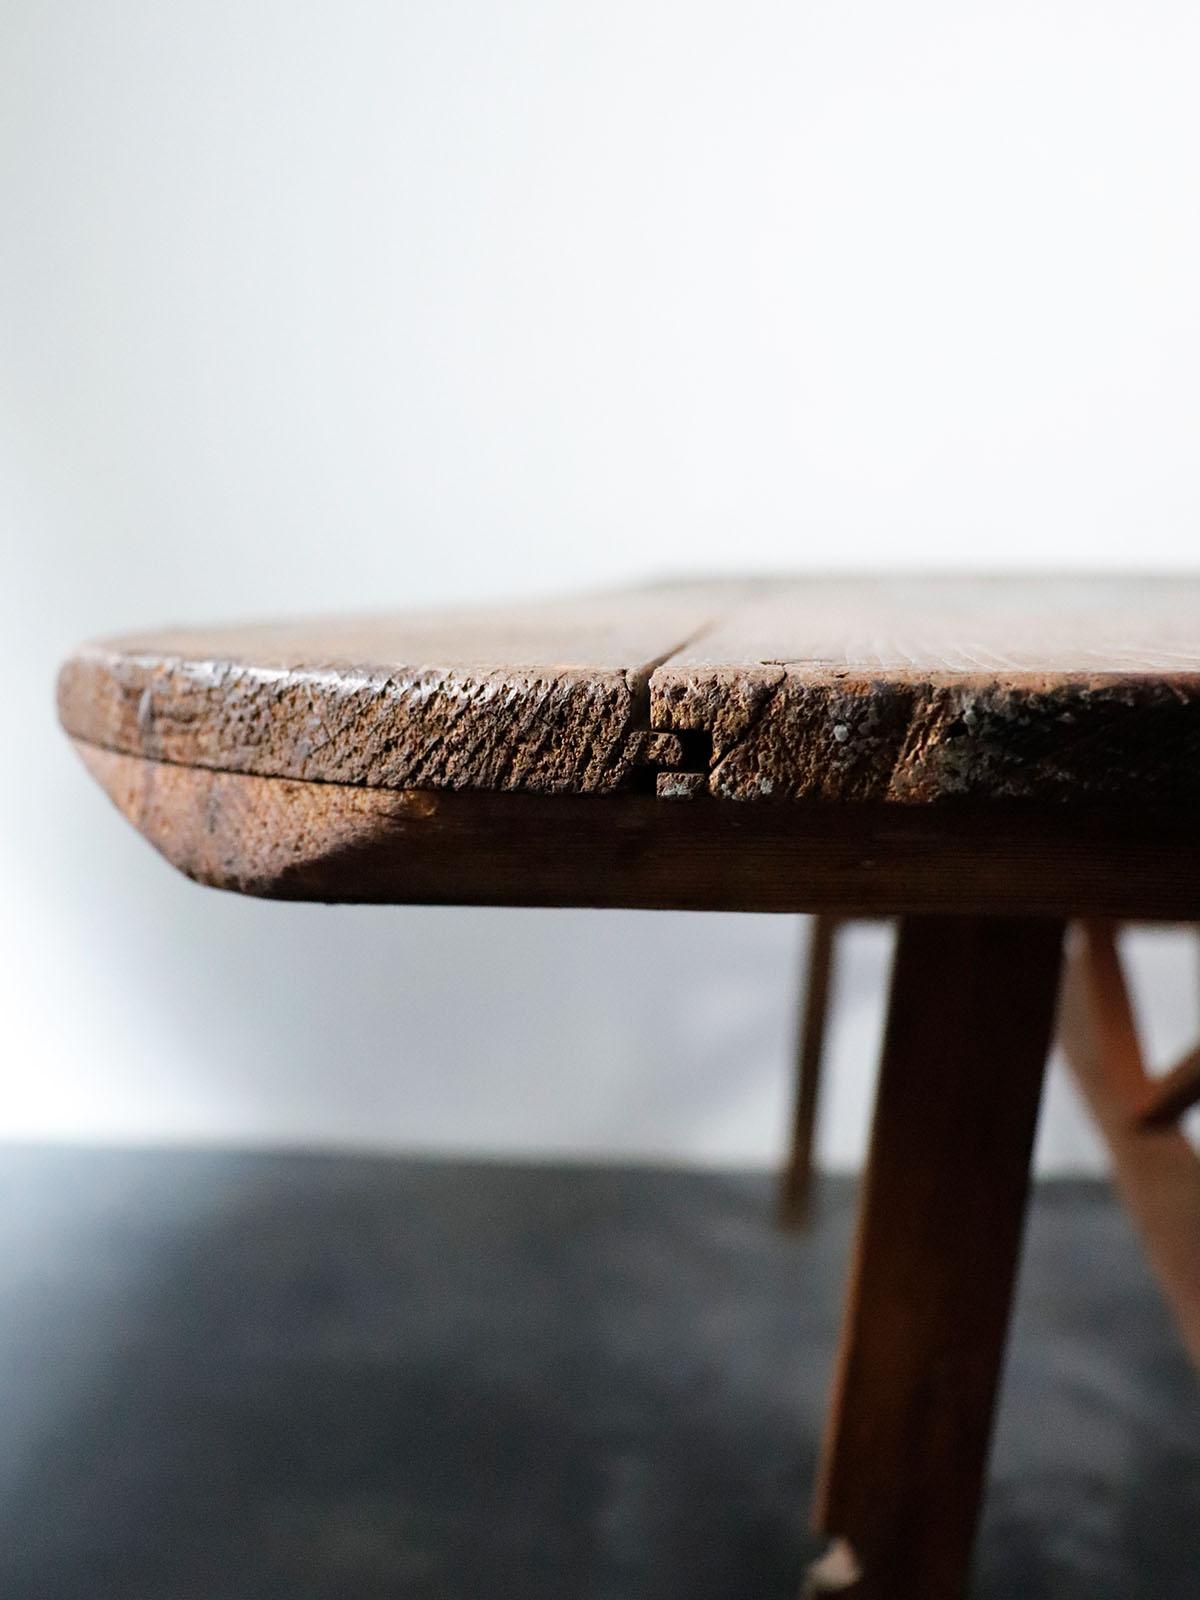 work table,wood table,usa,vintage,table